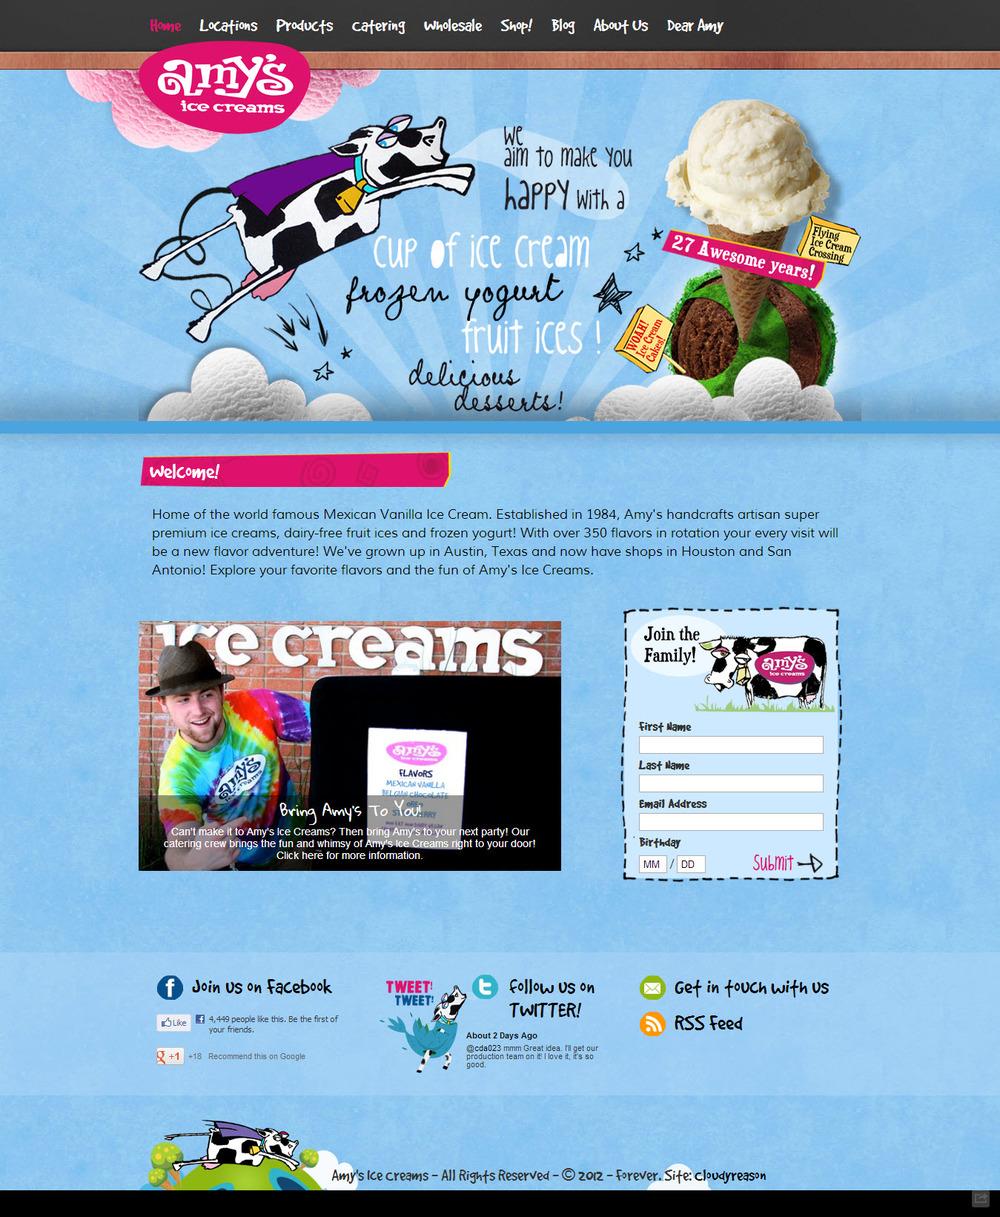 amys-ice-creams.jpg